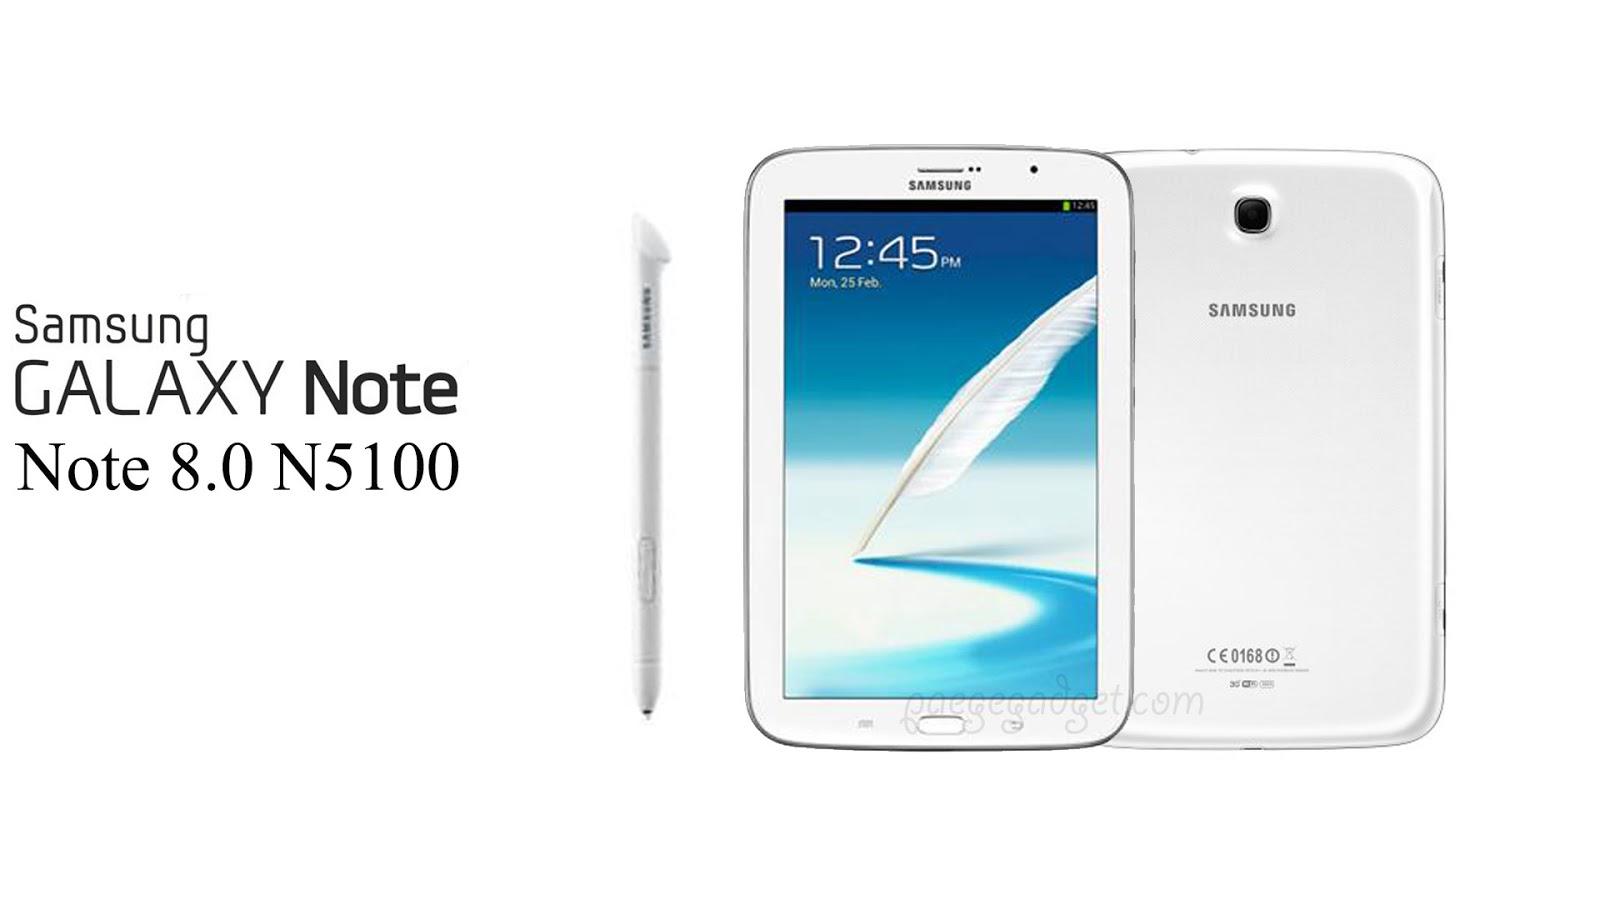 Smartphone Terbaru; Samsung Galaxy Note N5100